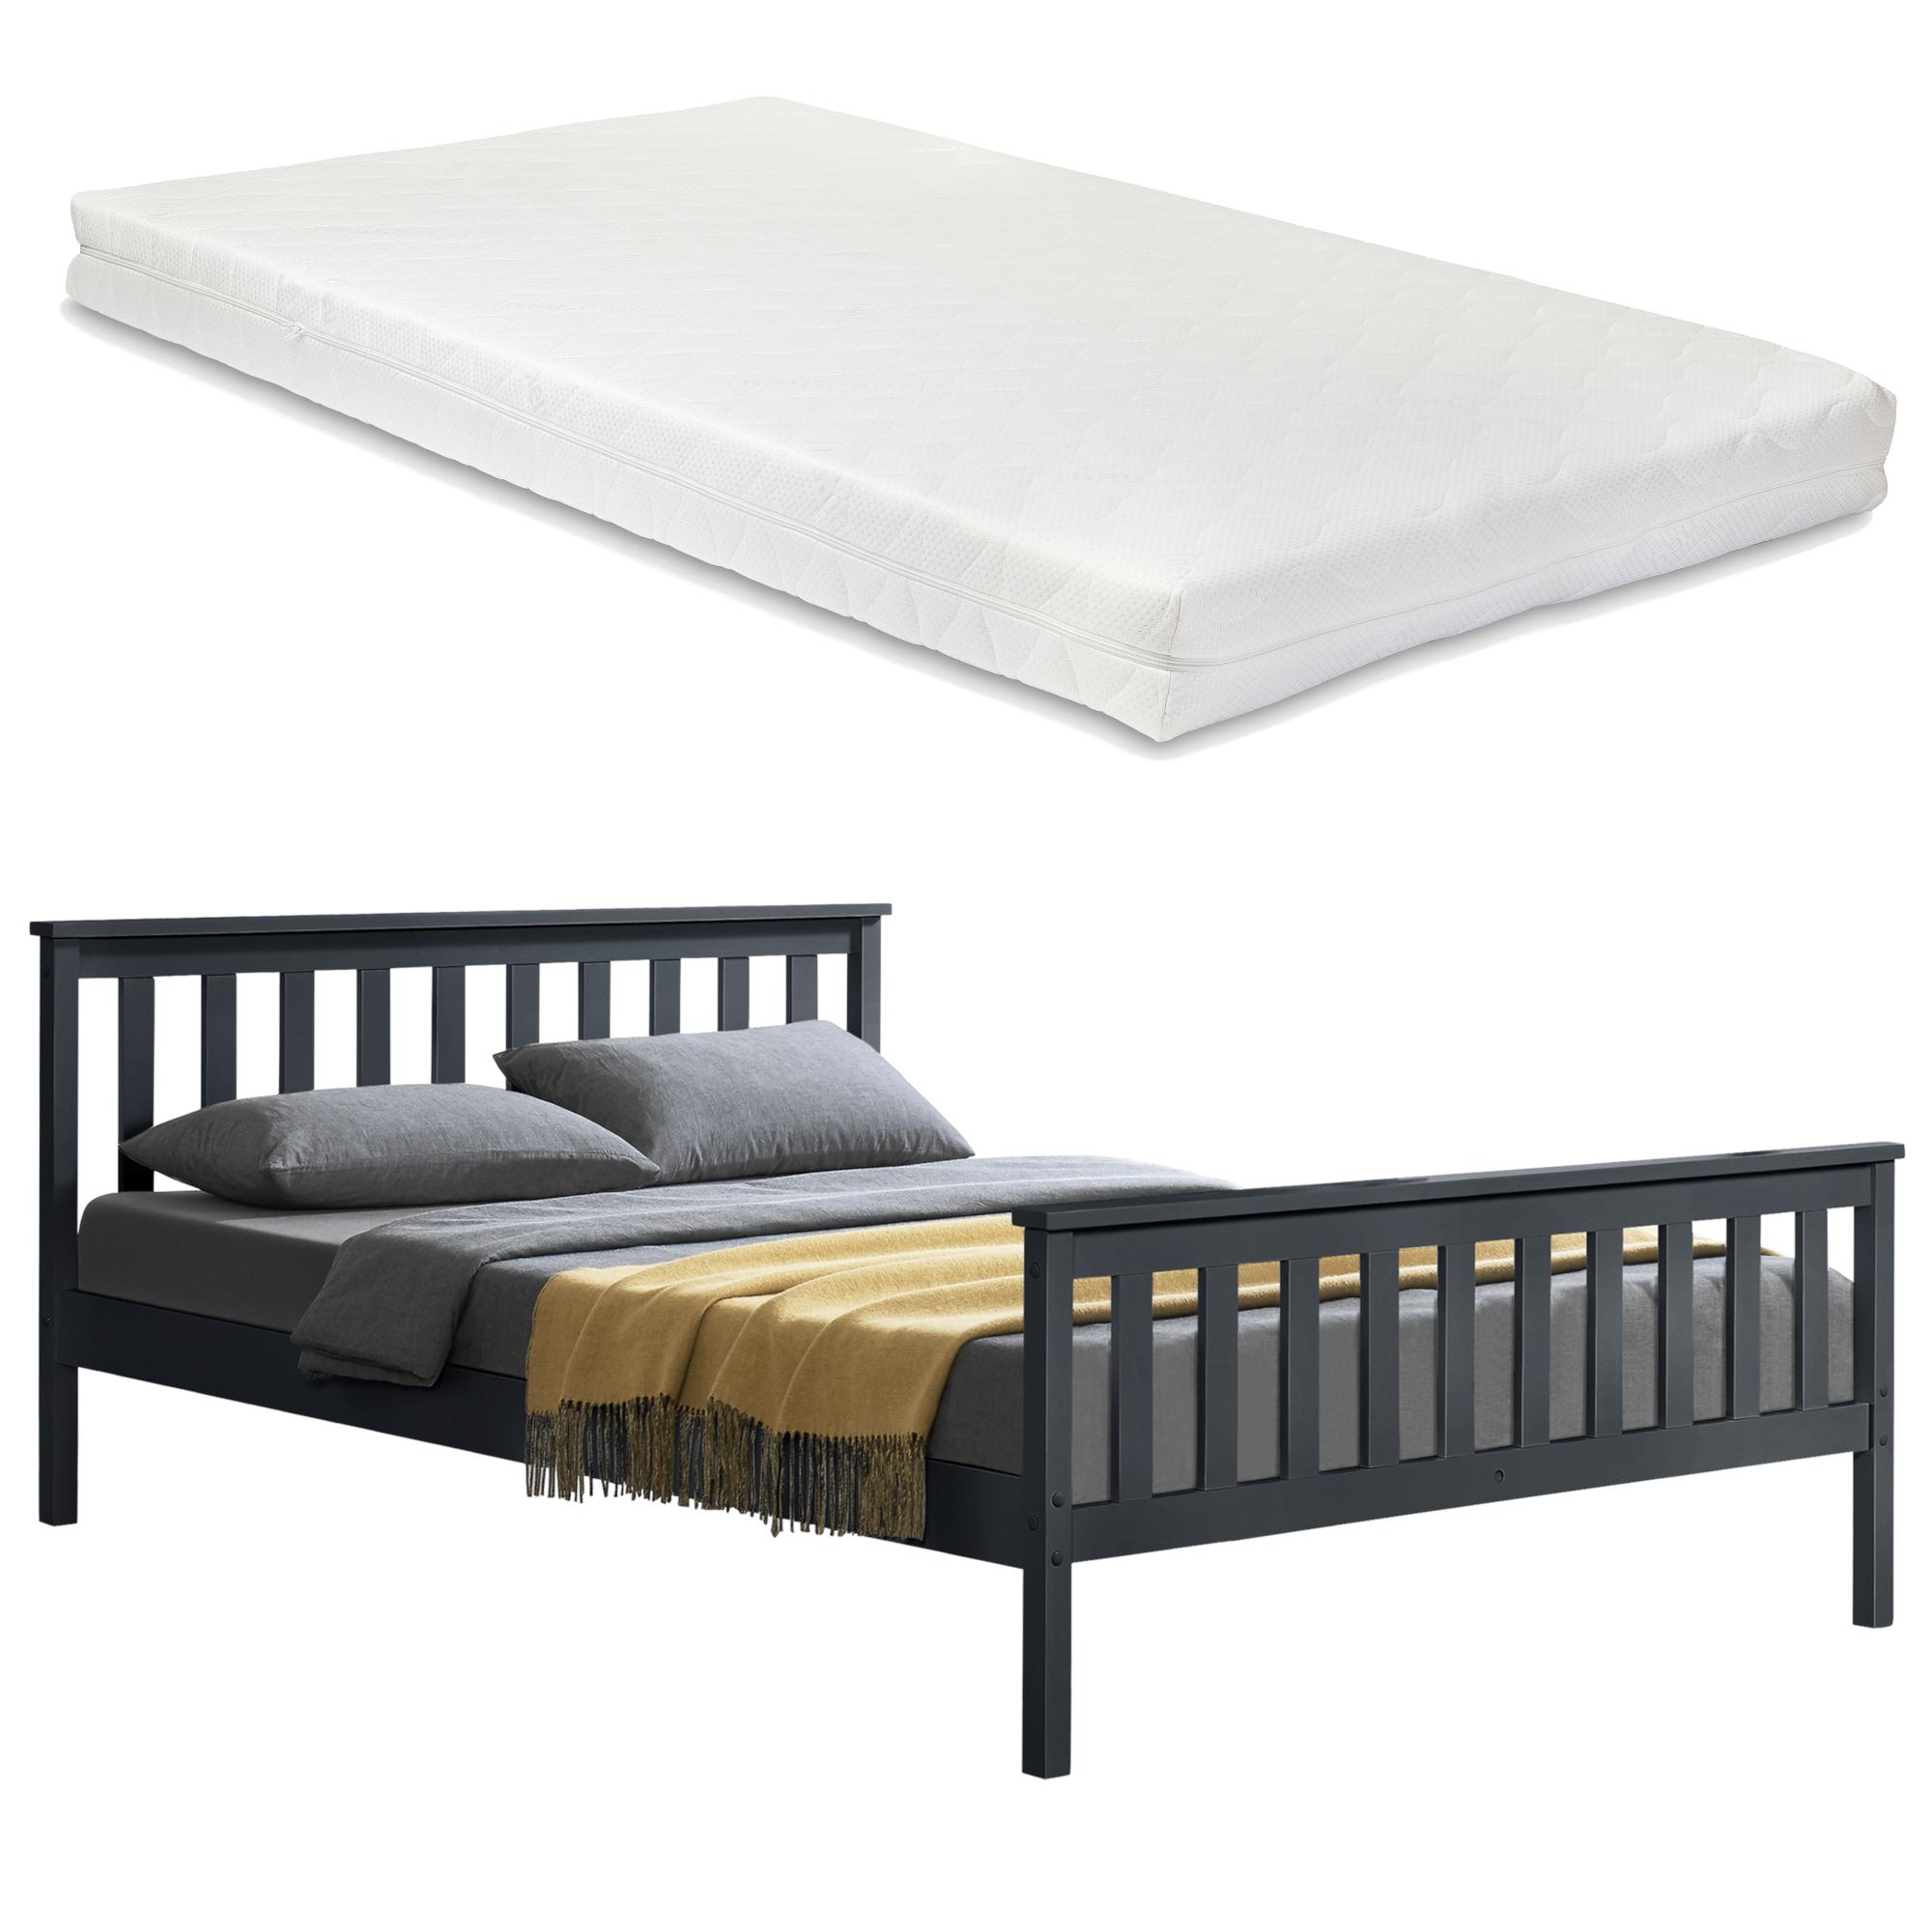 Full Size of Bett Matratzen Test 2018 Matratze 140x200 1 Reinigen Kaufen Bodyguard Encasa Holzbett 140x200cm Mit Doppelbett Kiefer Konfigurieren Bettkasten Bett Bett Matratze